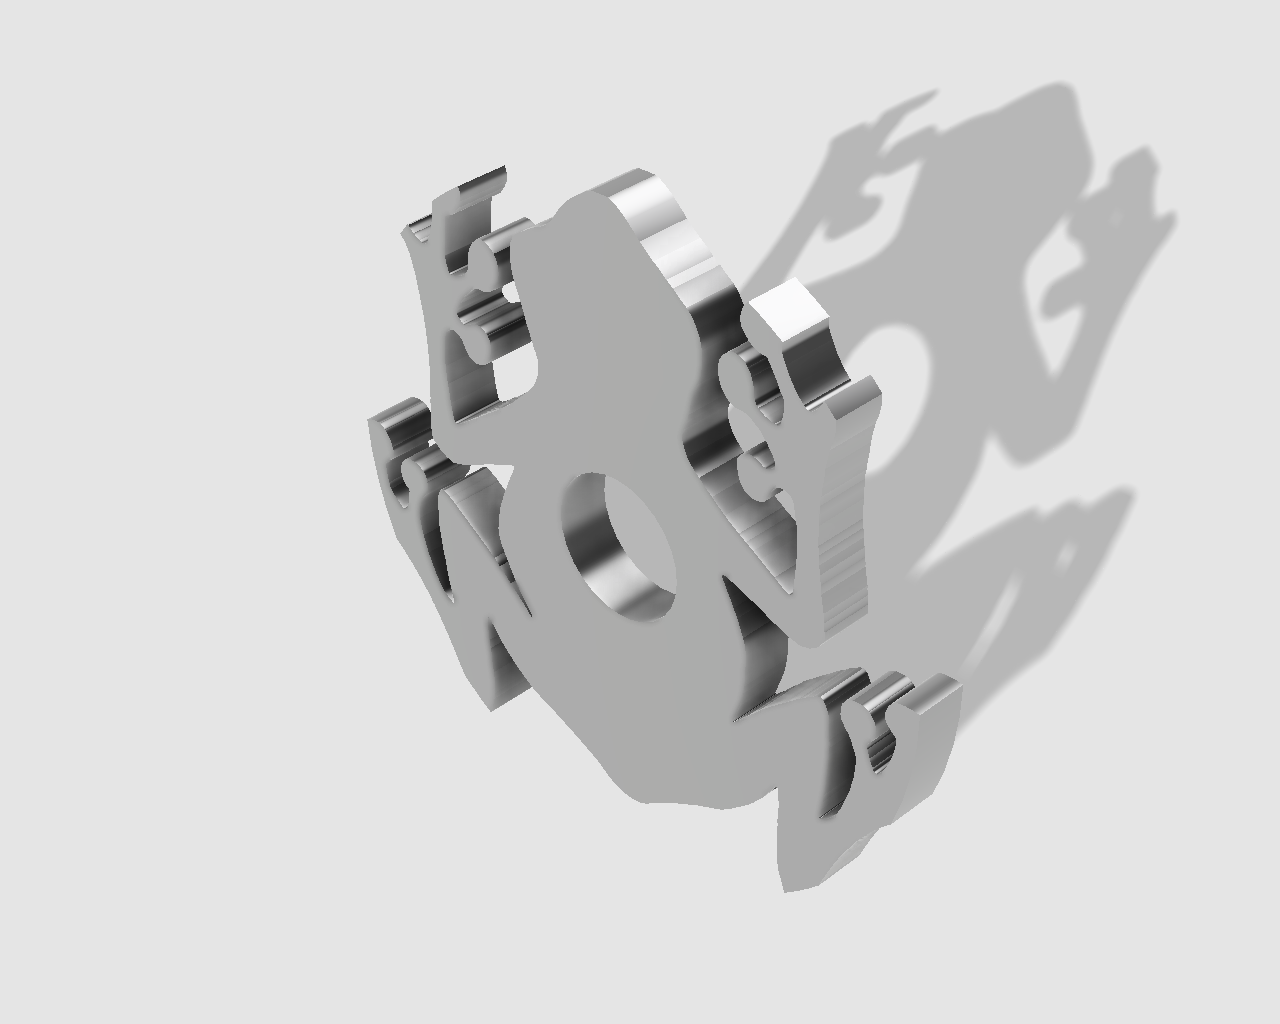 45rpm adaptor - frog